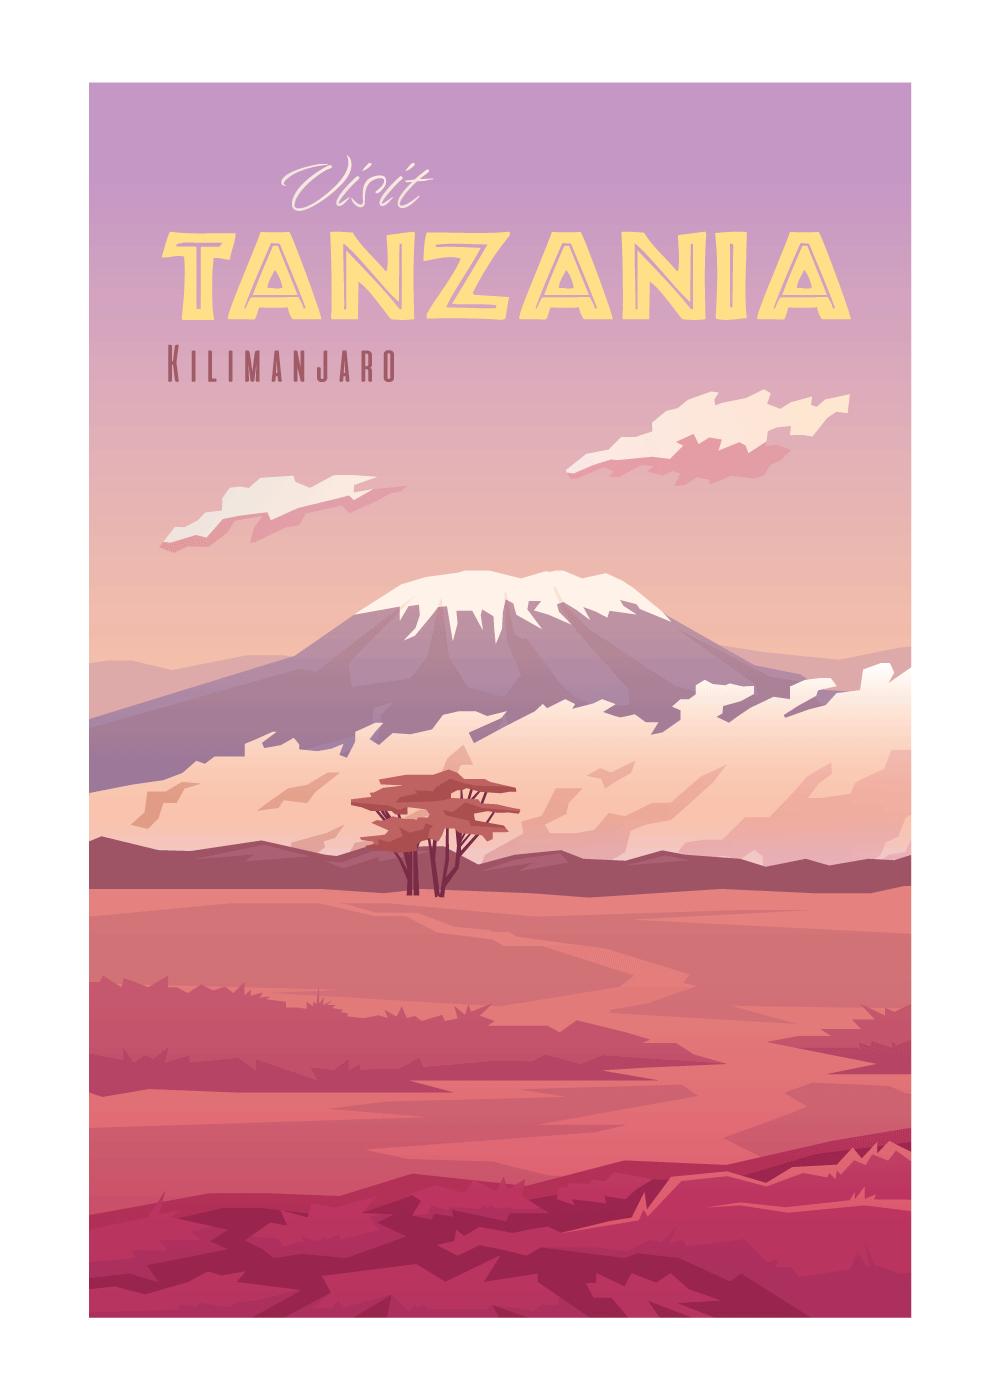 Visit Tanzania - rejse plakat